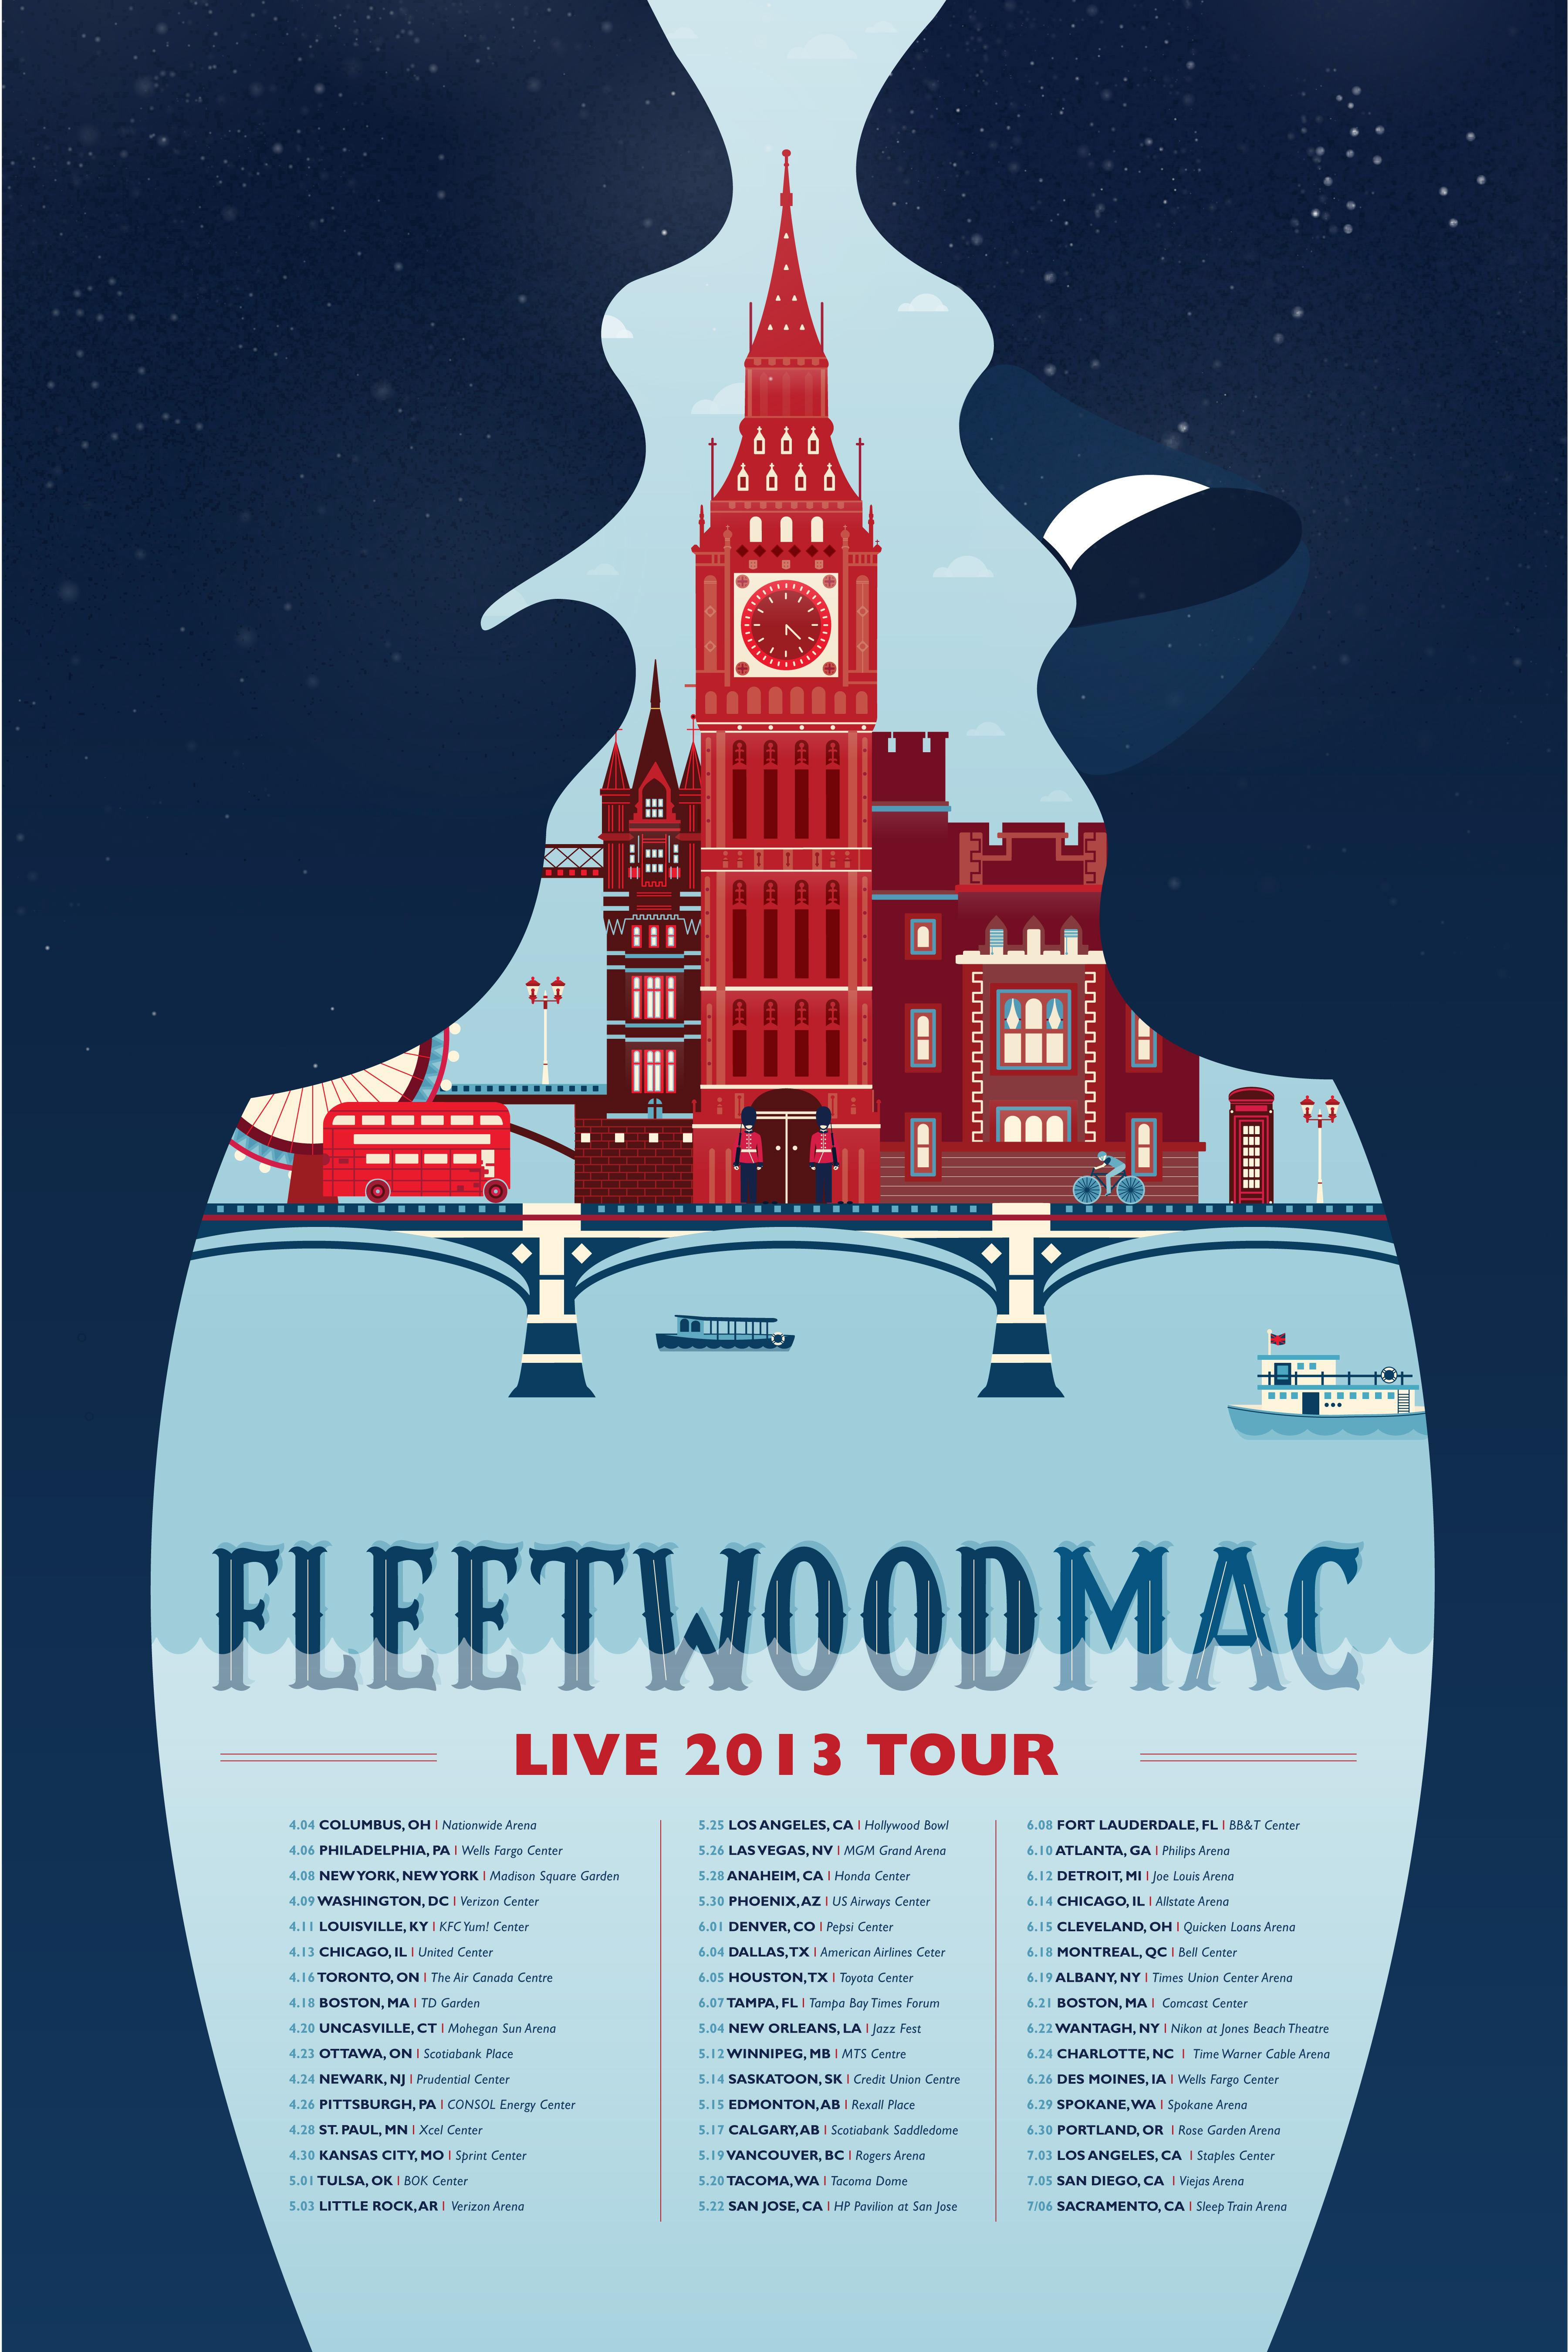 Fleetwood Mac - image 1 - student project